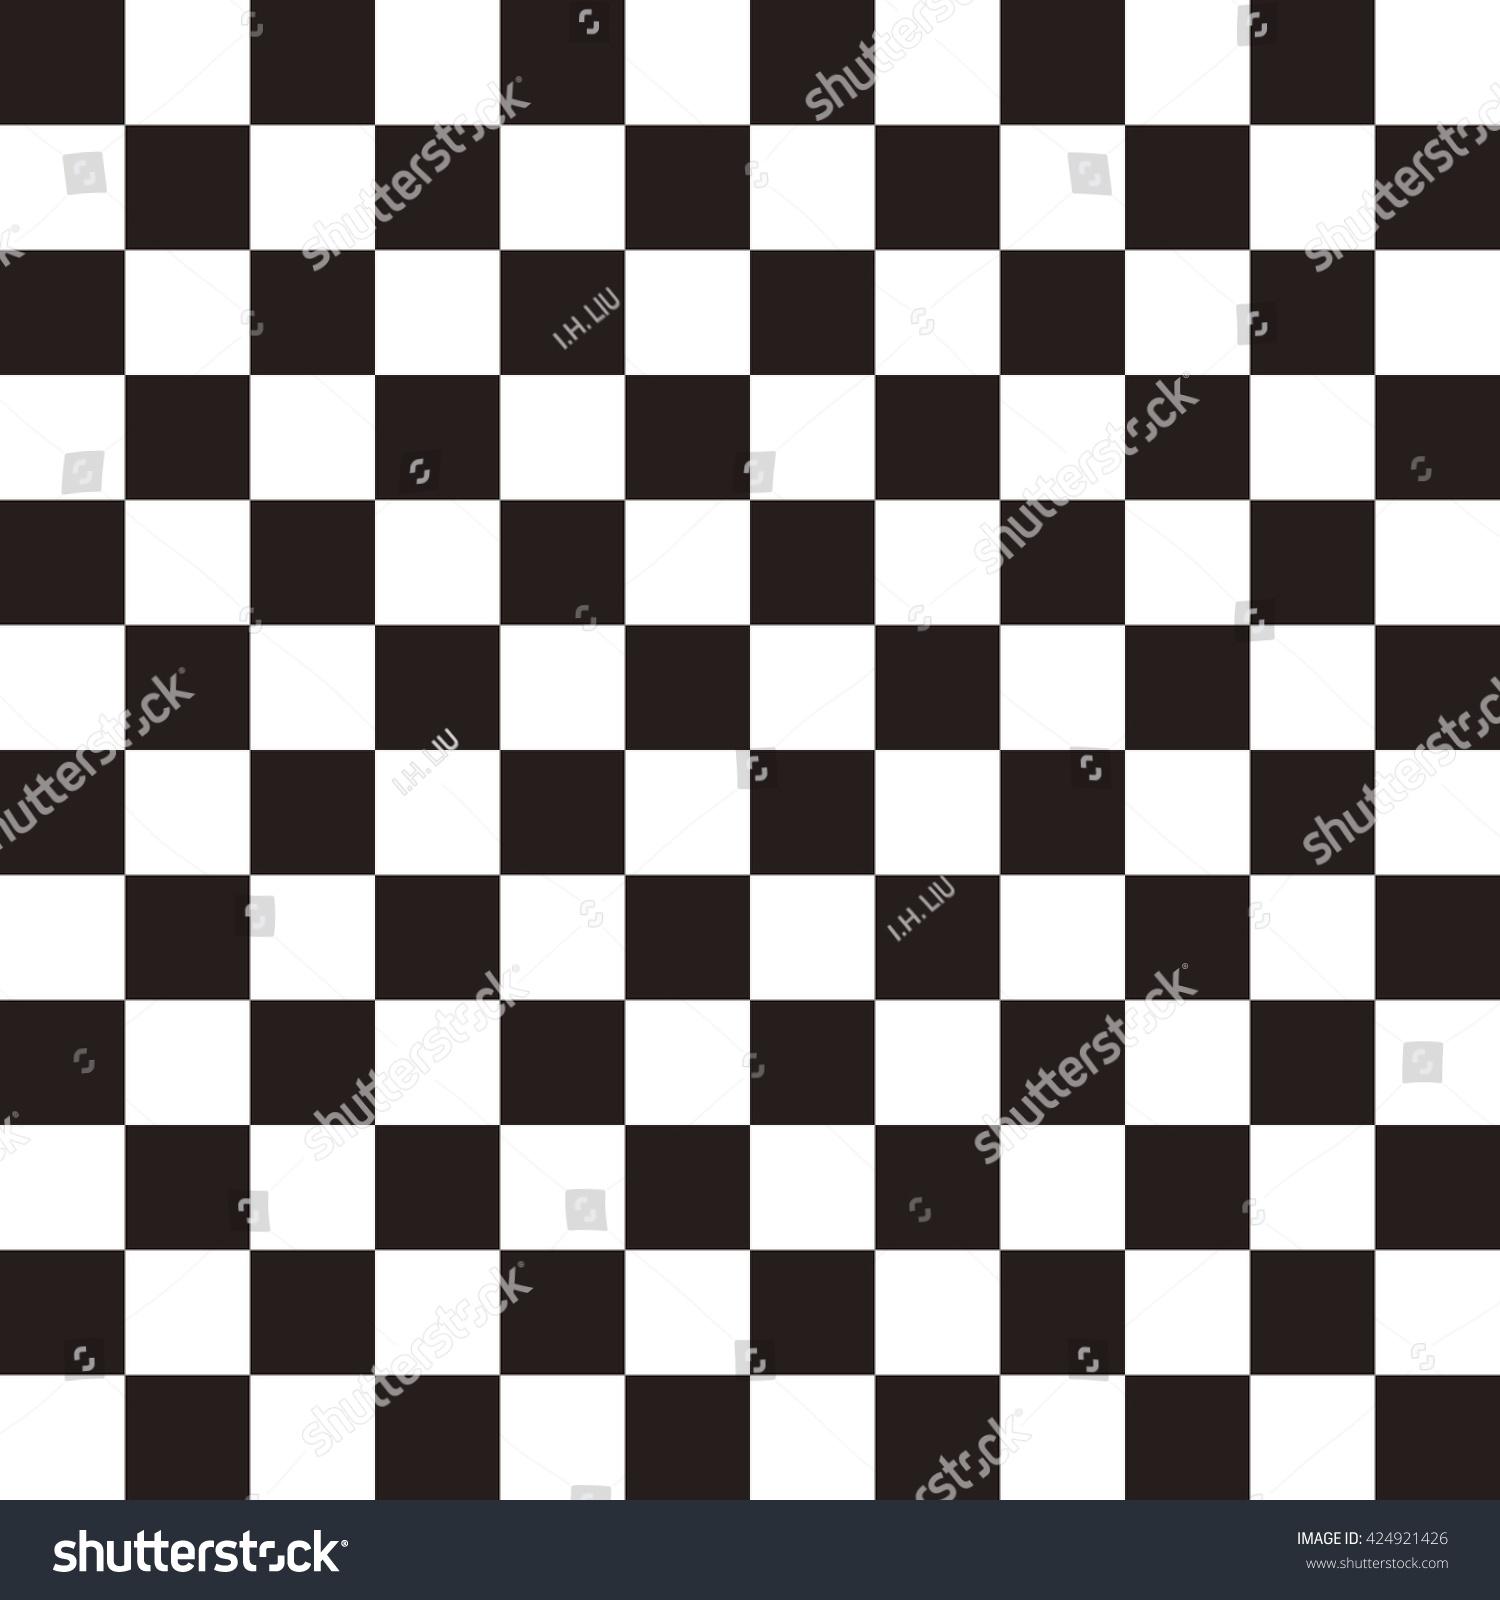 Checkered Design Checkered Design Stock Vector 424921426 Shutterstock